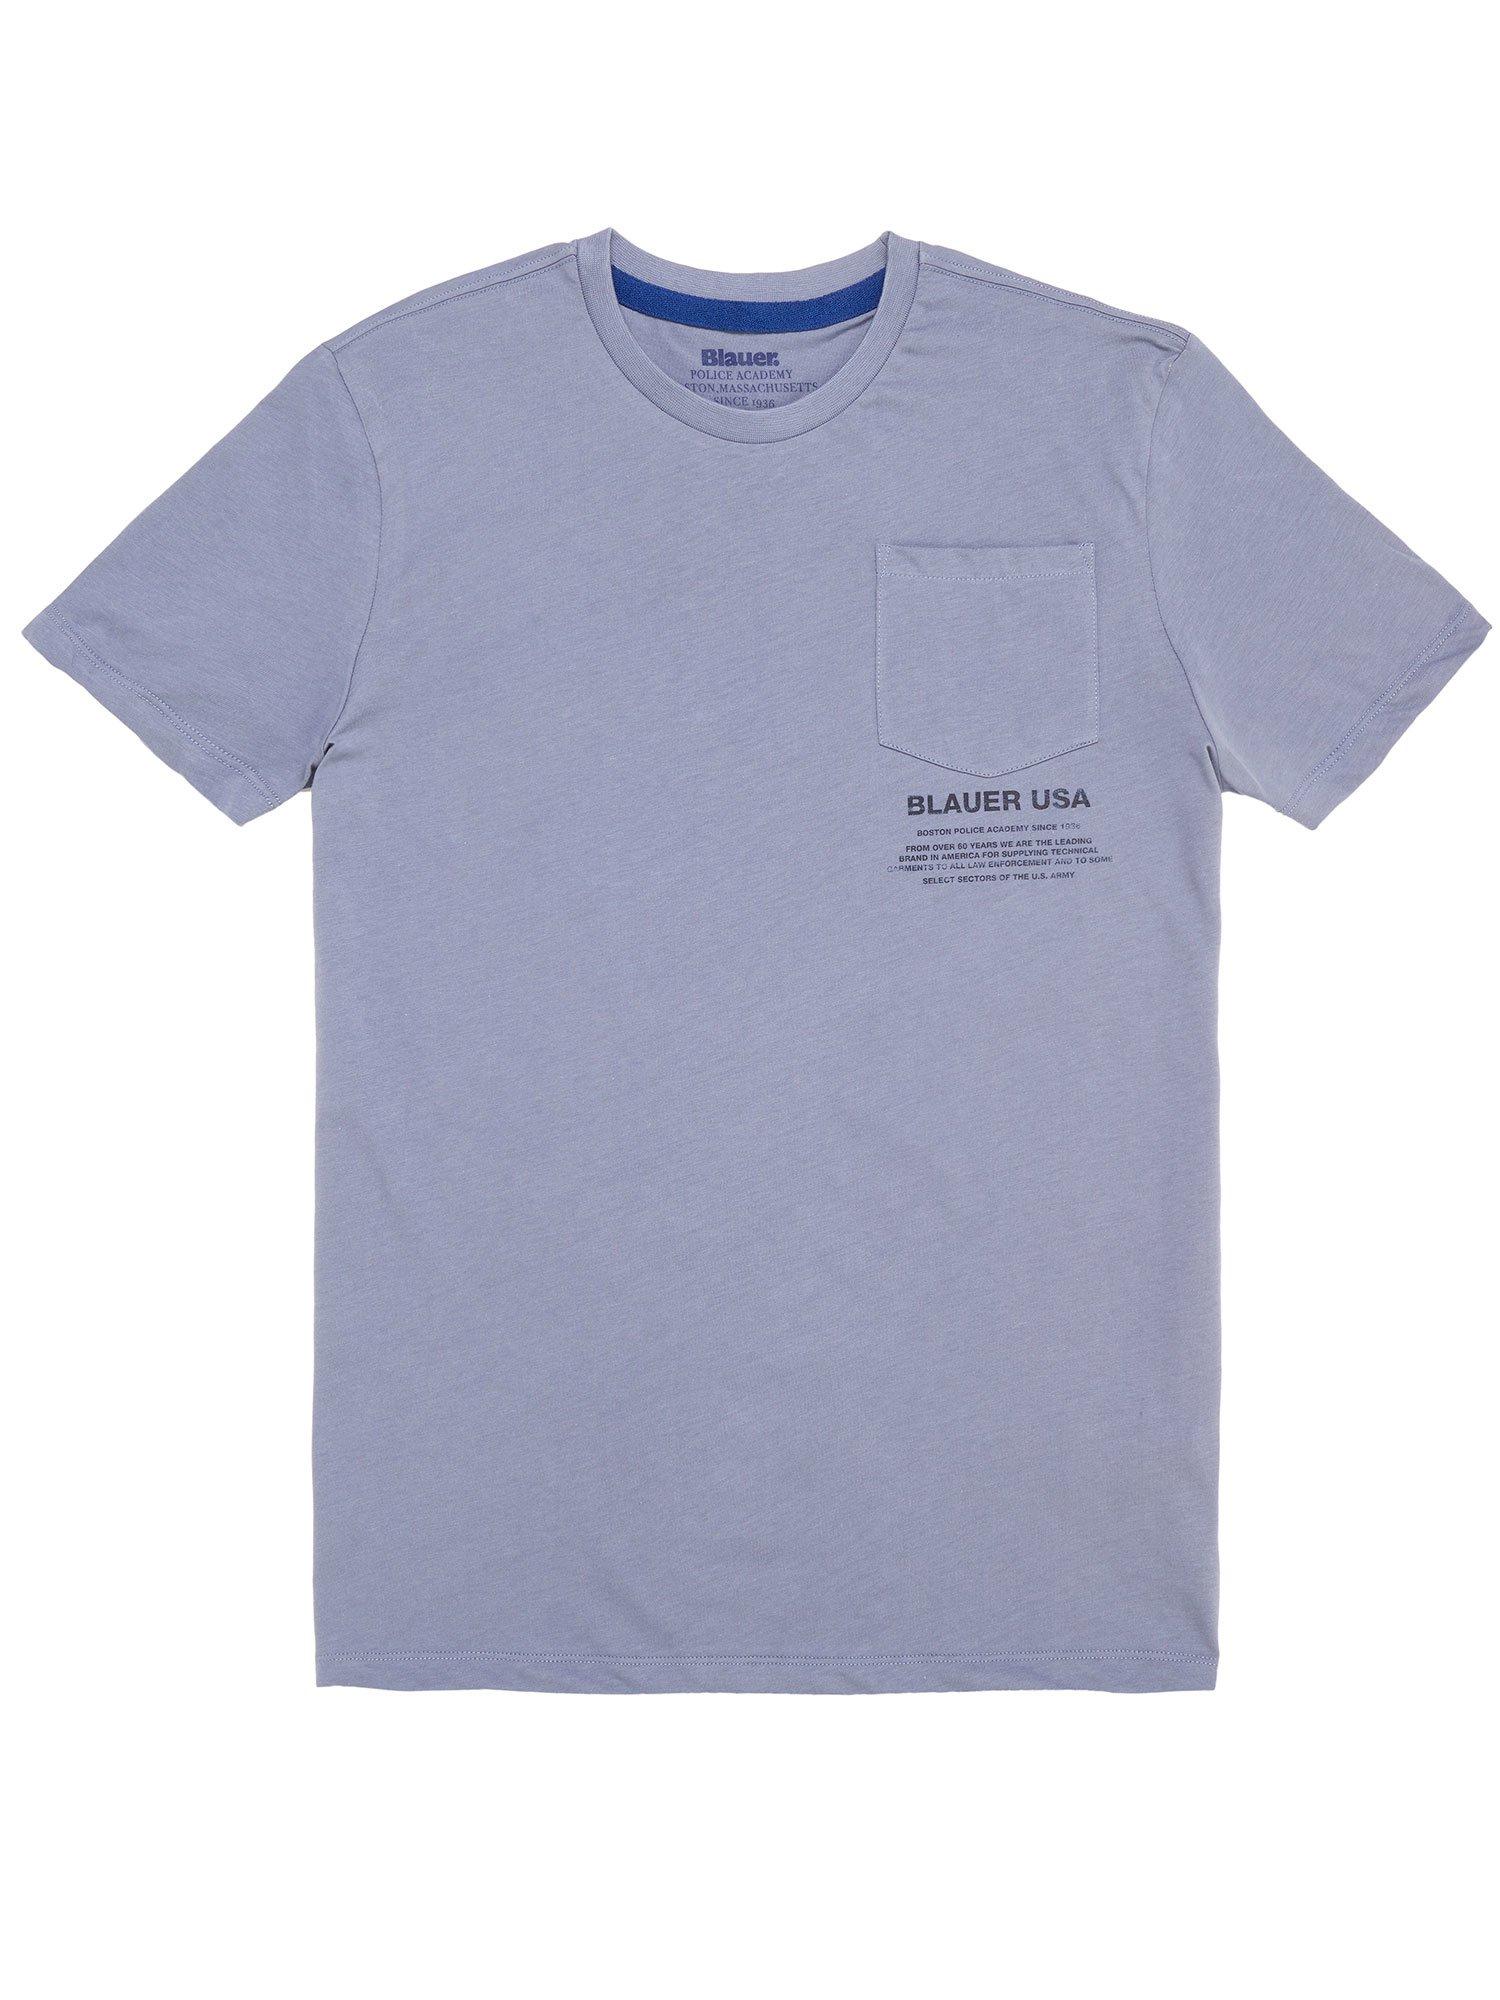 Blauer - T-SHIRT CON TASCHINO - Avio Scuro - Blauer